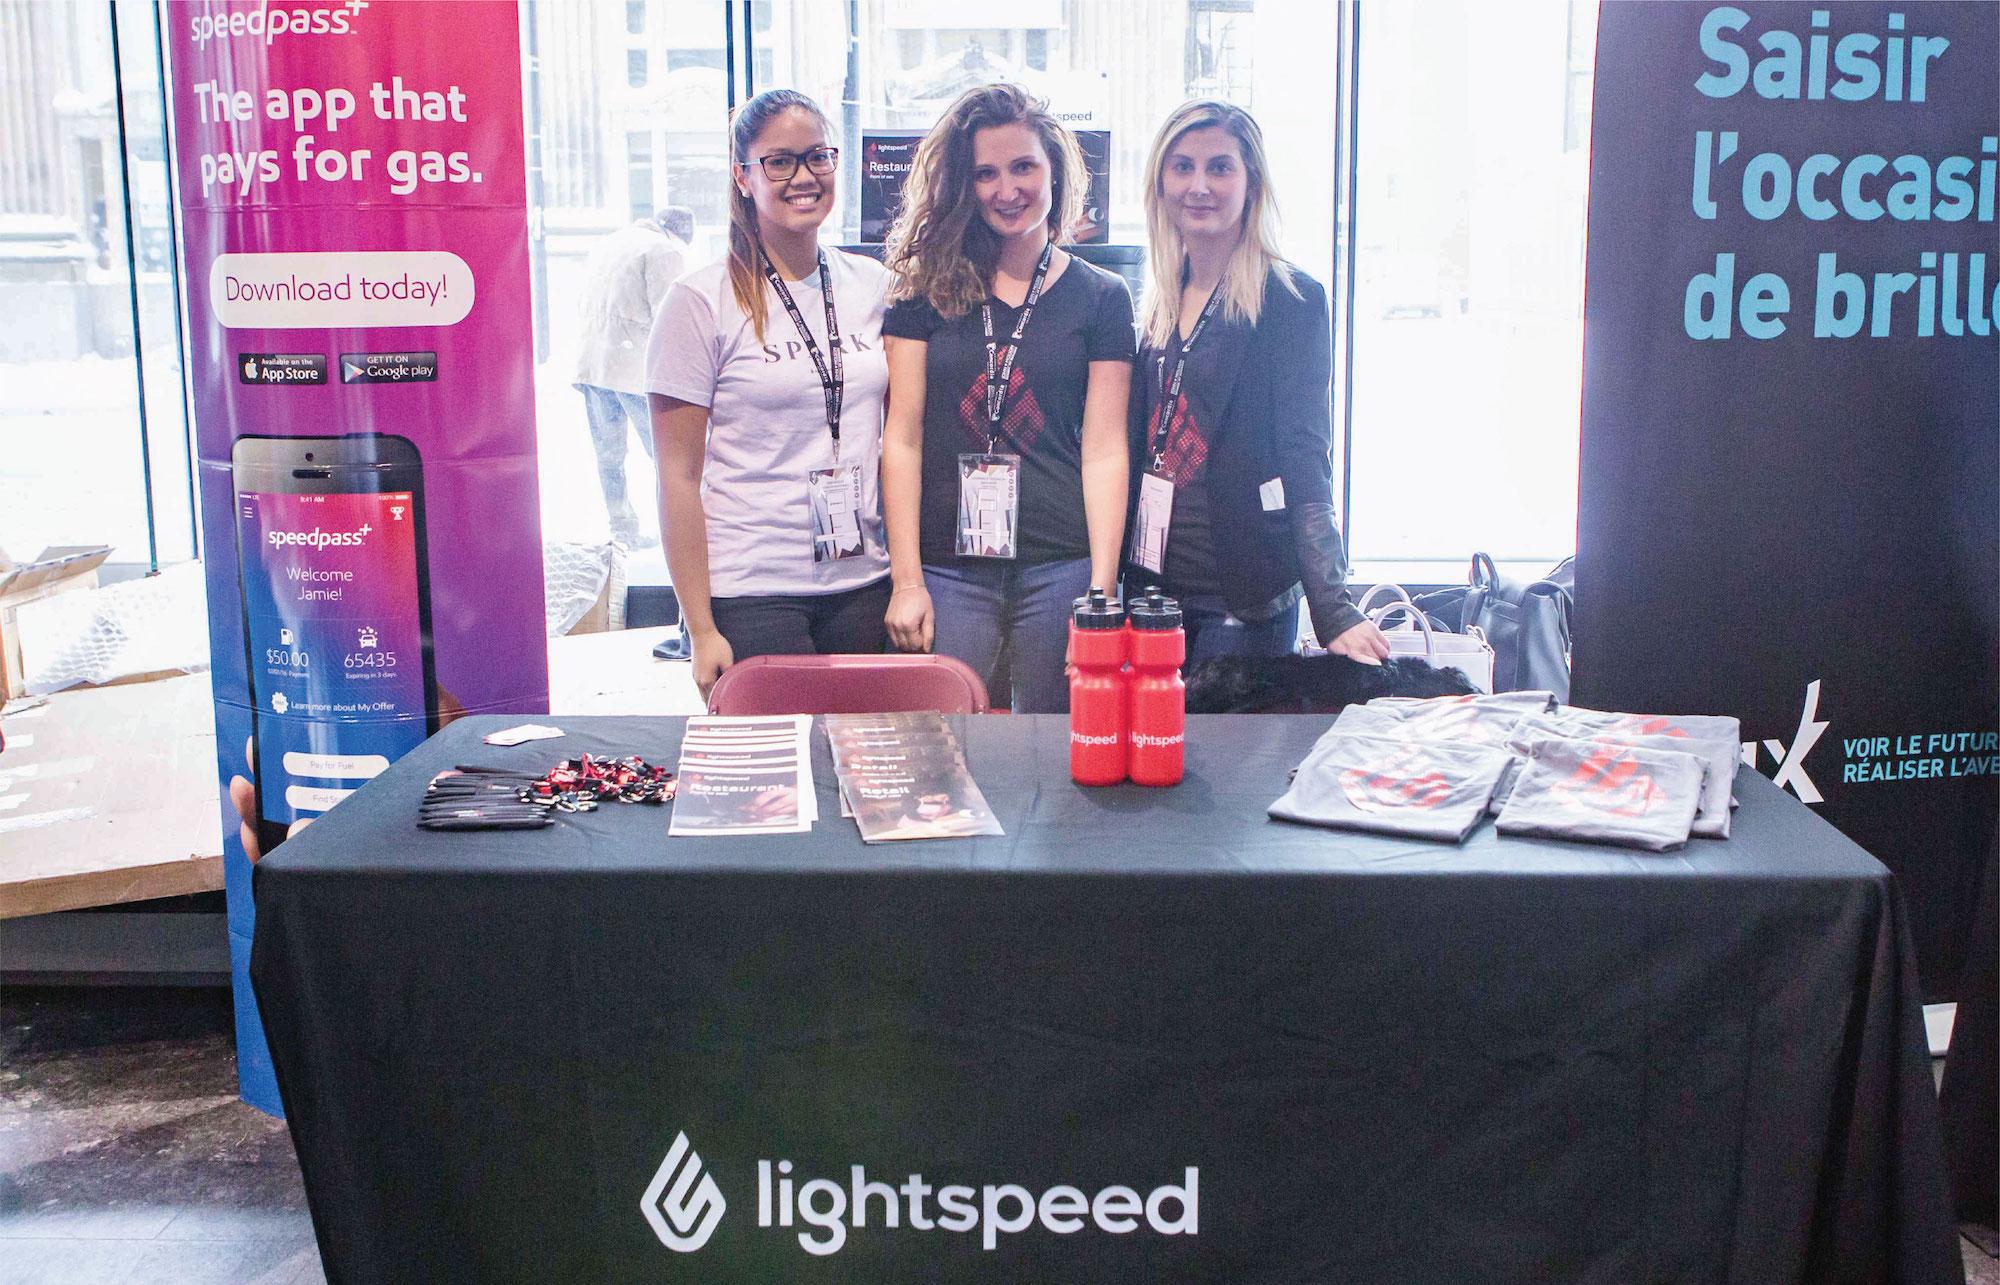 Lightspeed at JDC 2018